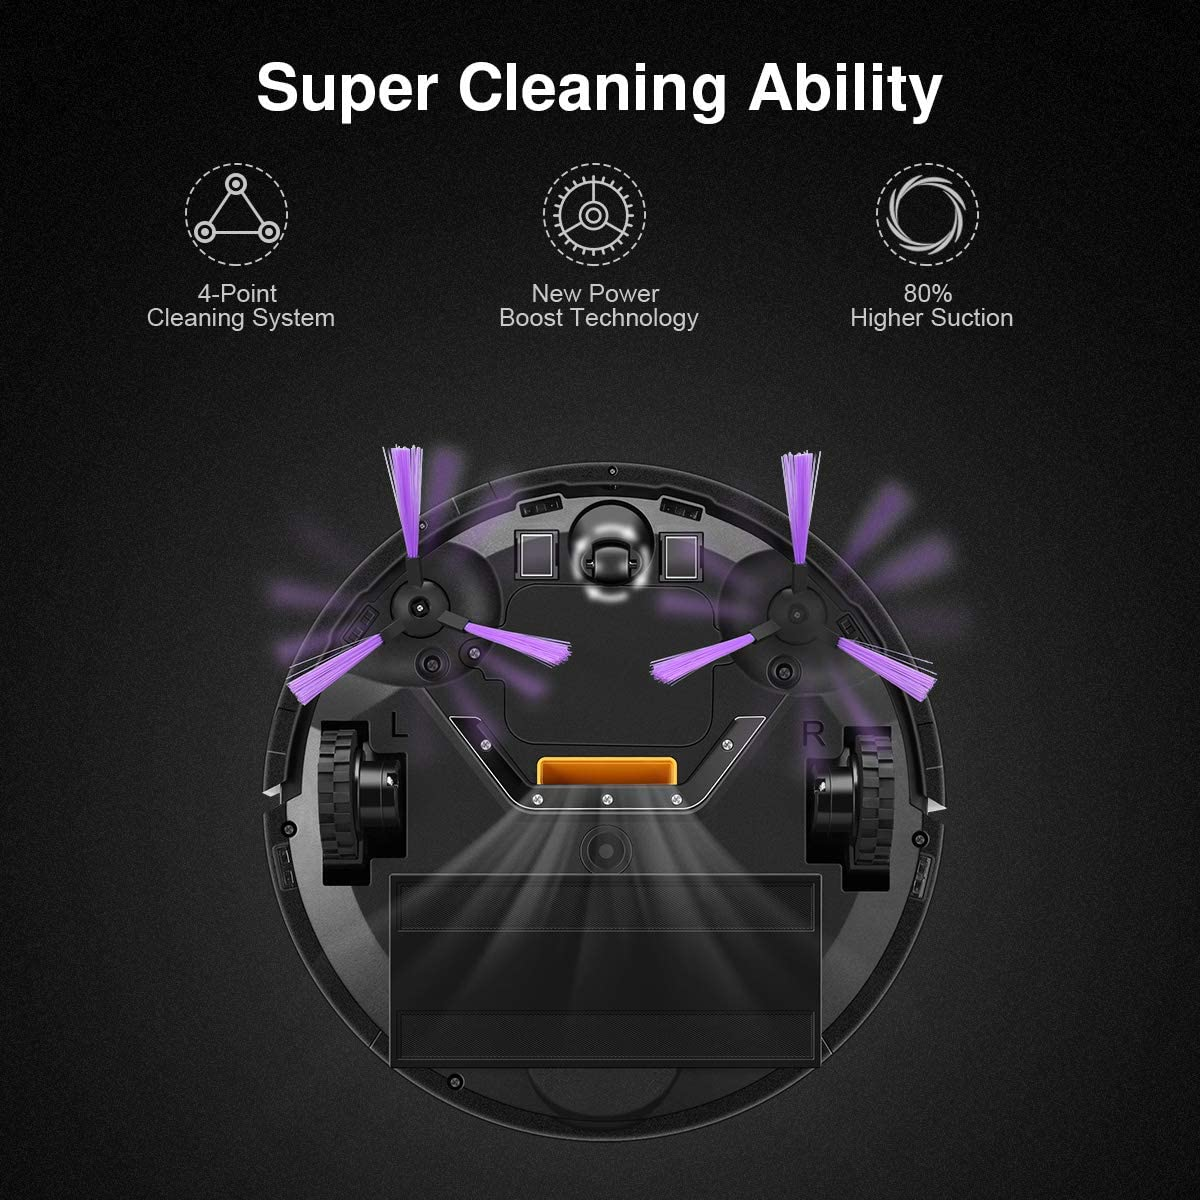 Diggro KK320 Robot Aspirador de Limpieza Patentado Aspirador de ...